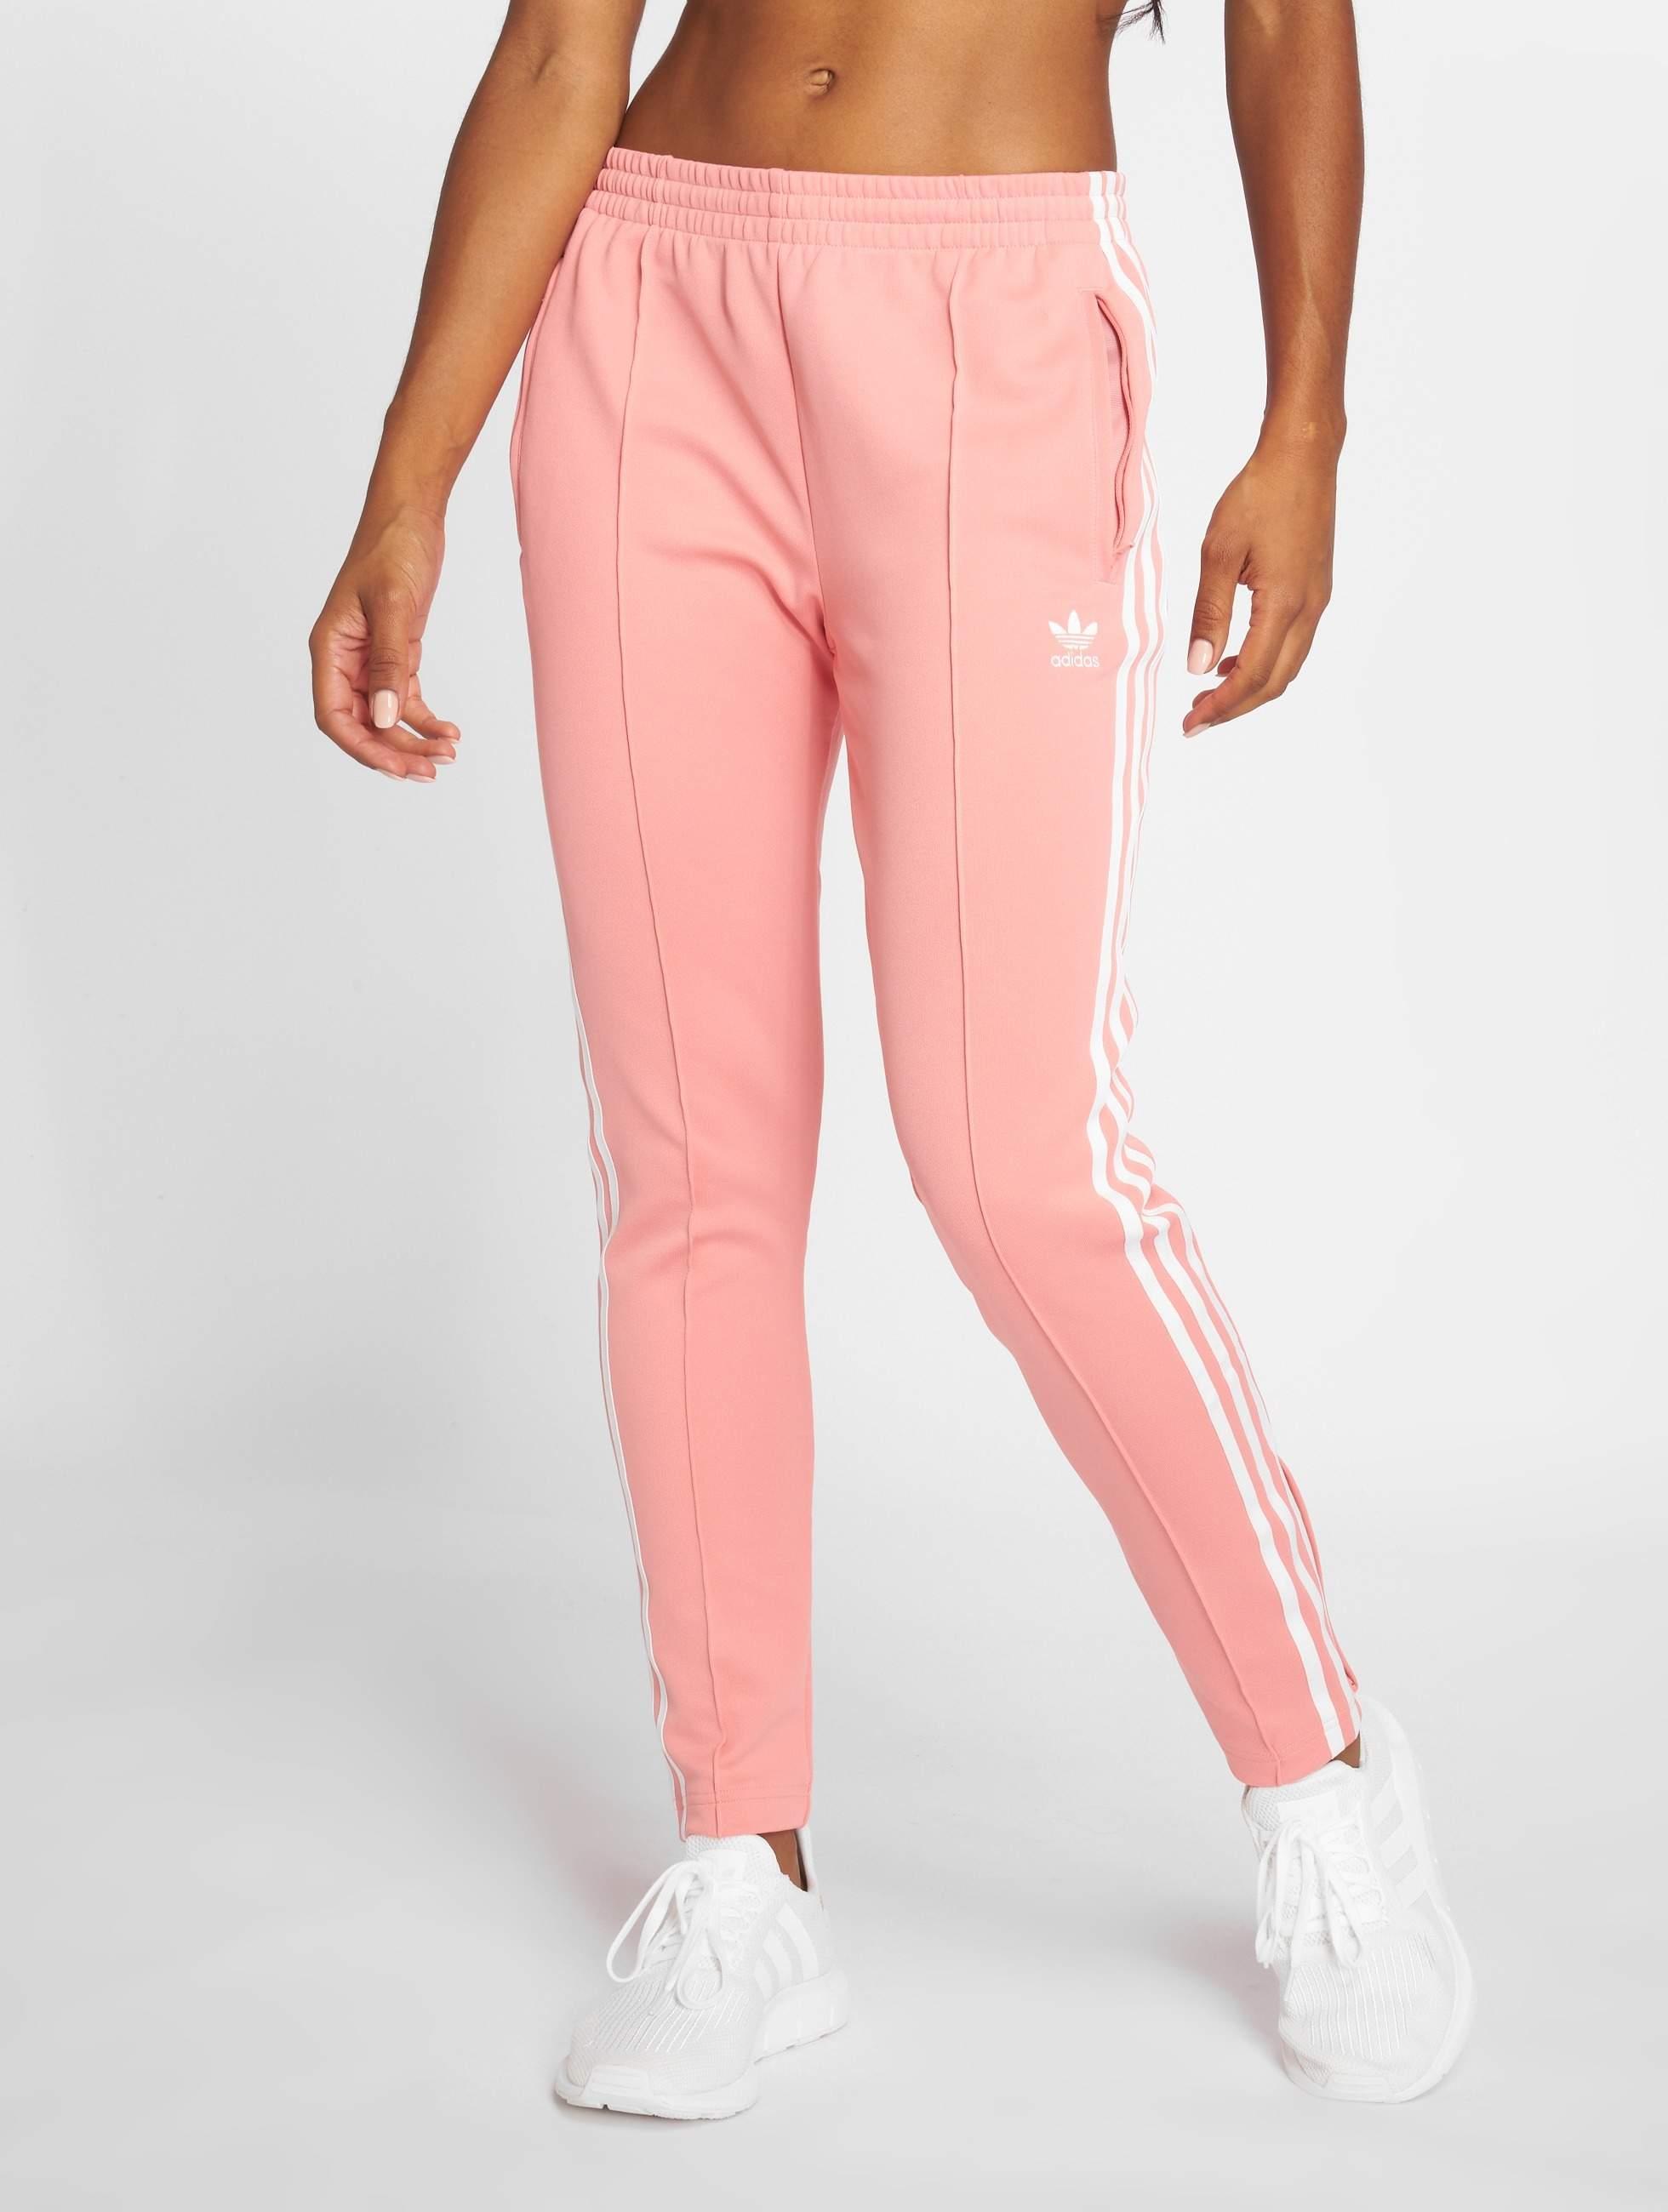 adidas jogginghose rosa